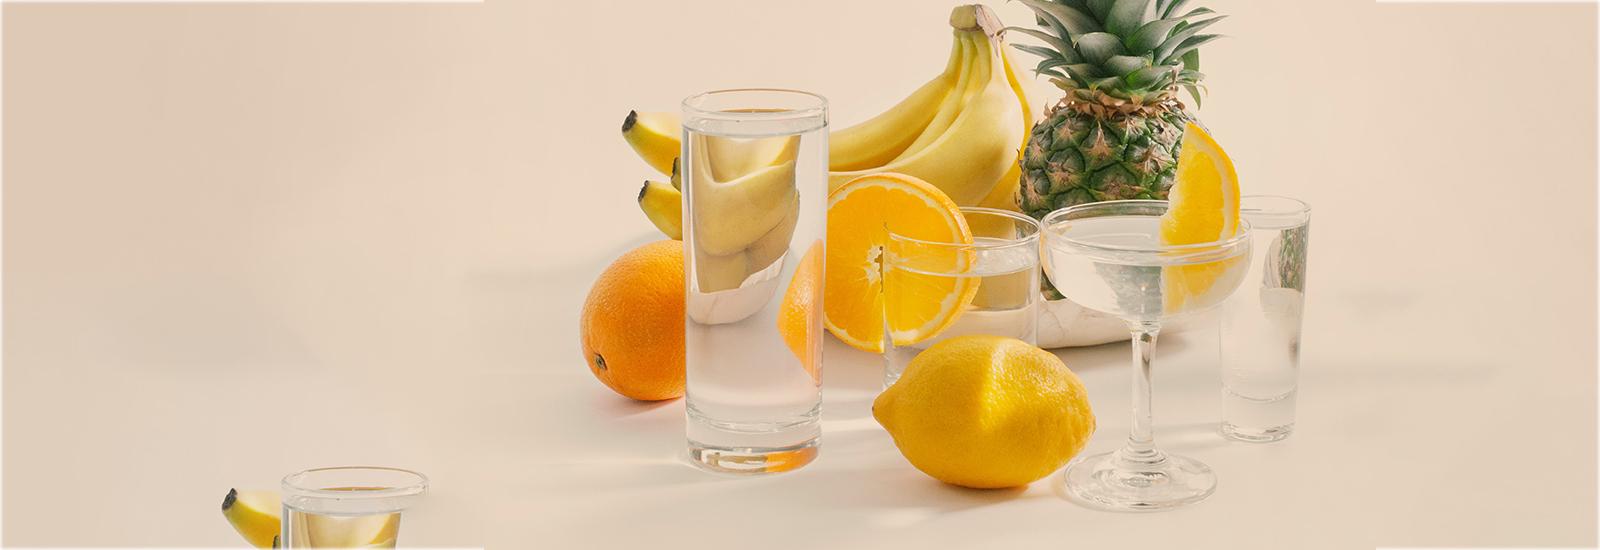 fytonutriënten-vitaminstore